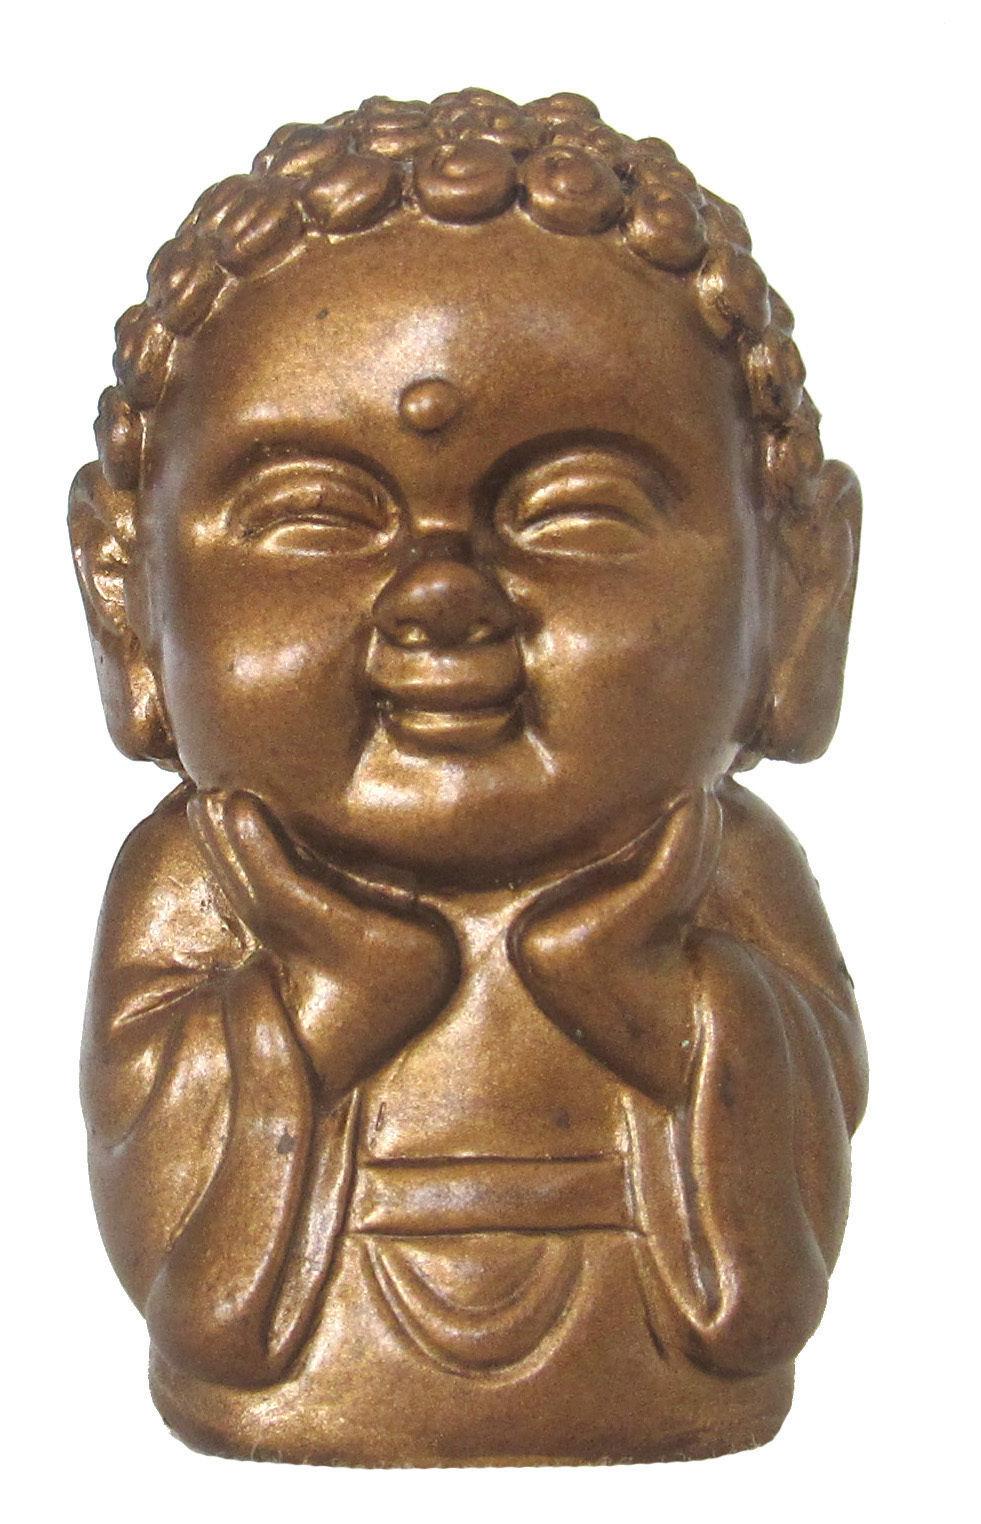 Pocket Buddha Figurine Toy Faith Peace Happiness Wisdom Love Harmony, set of 25